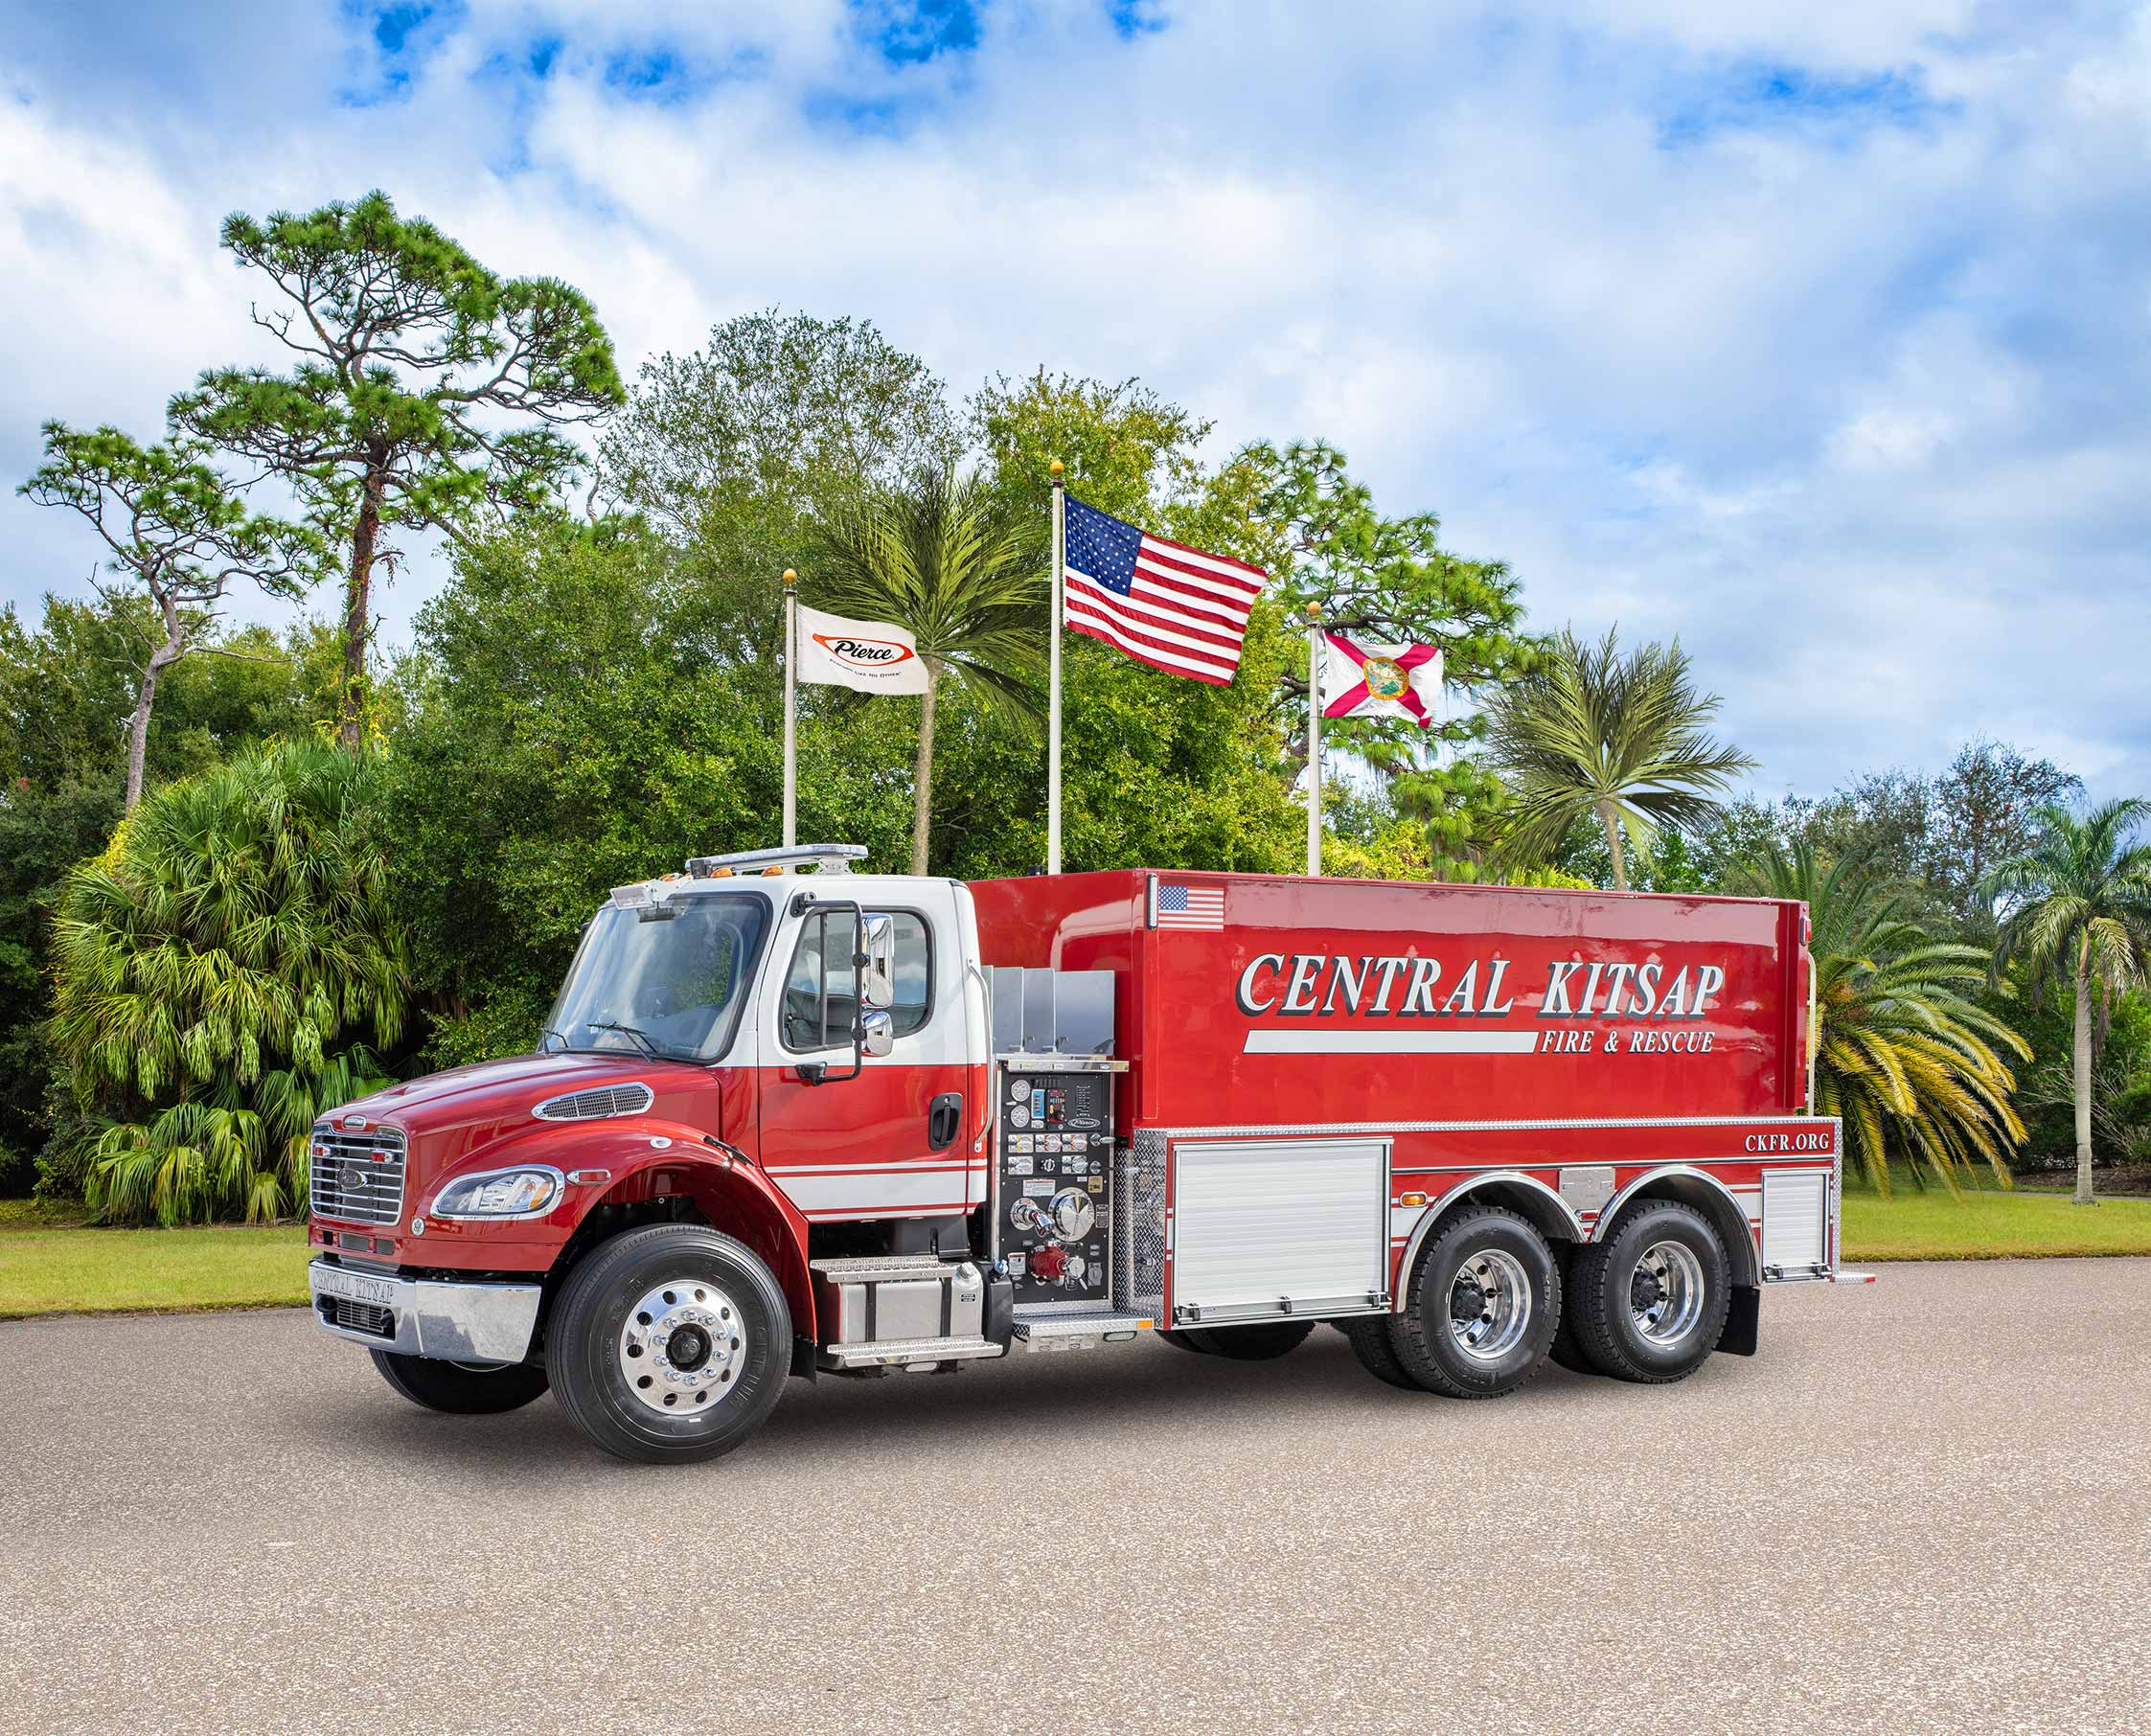 Central Kitsap Fire & Rescue - Tanker